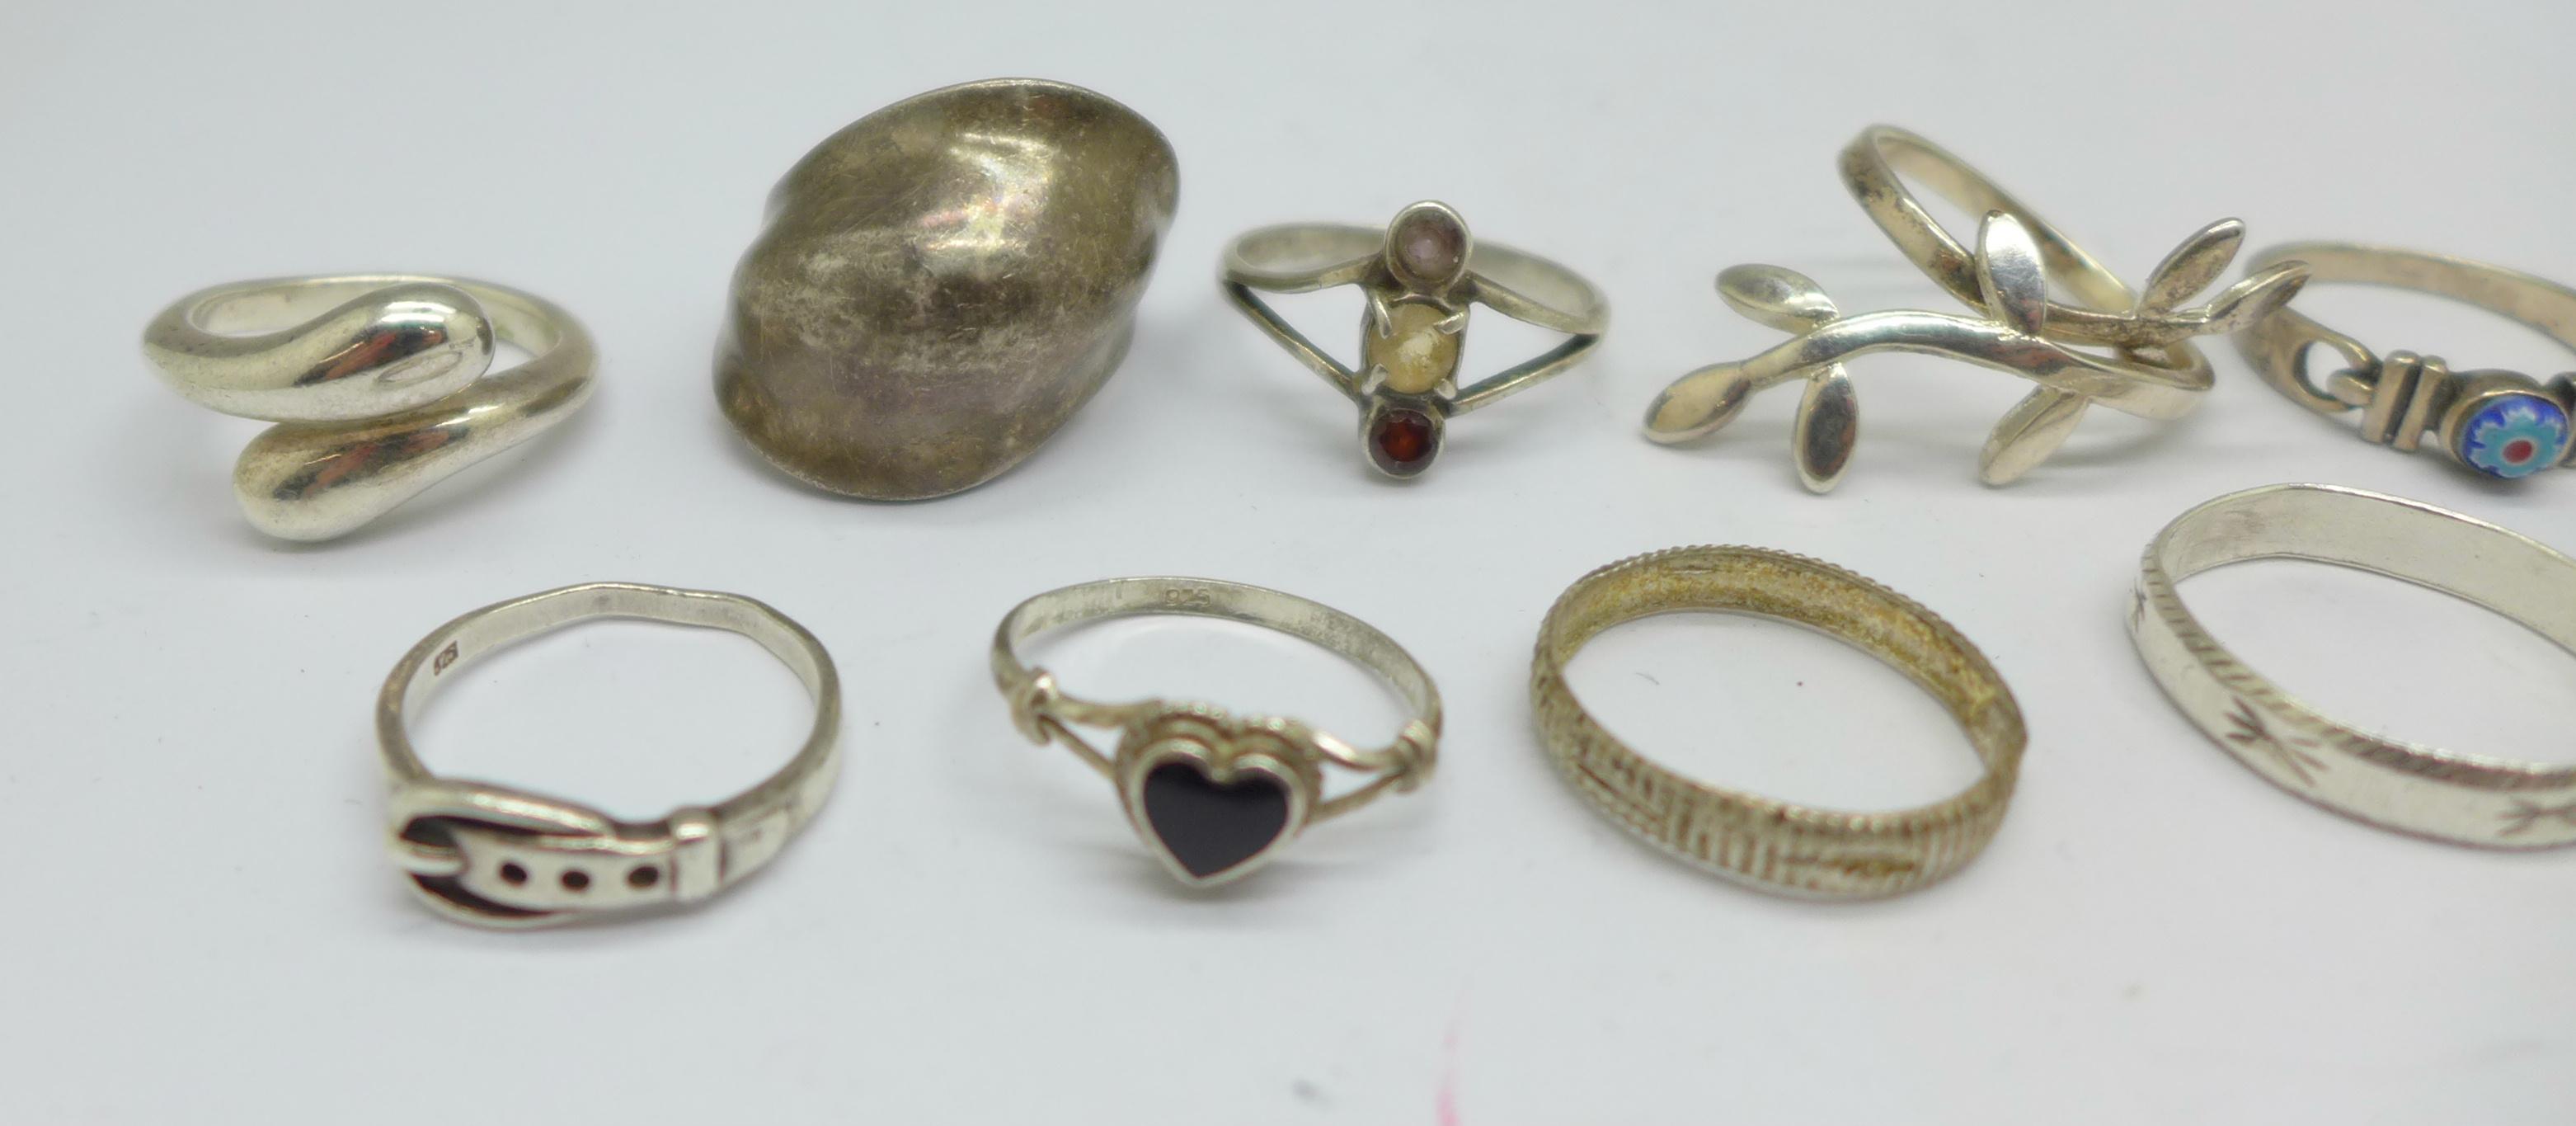 Ten silver rings, 28g - Image 3 of 5